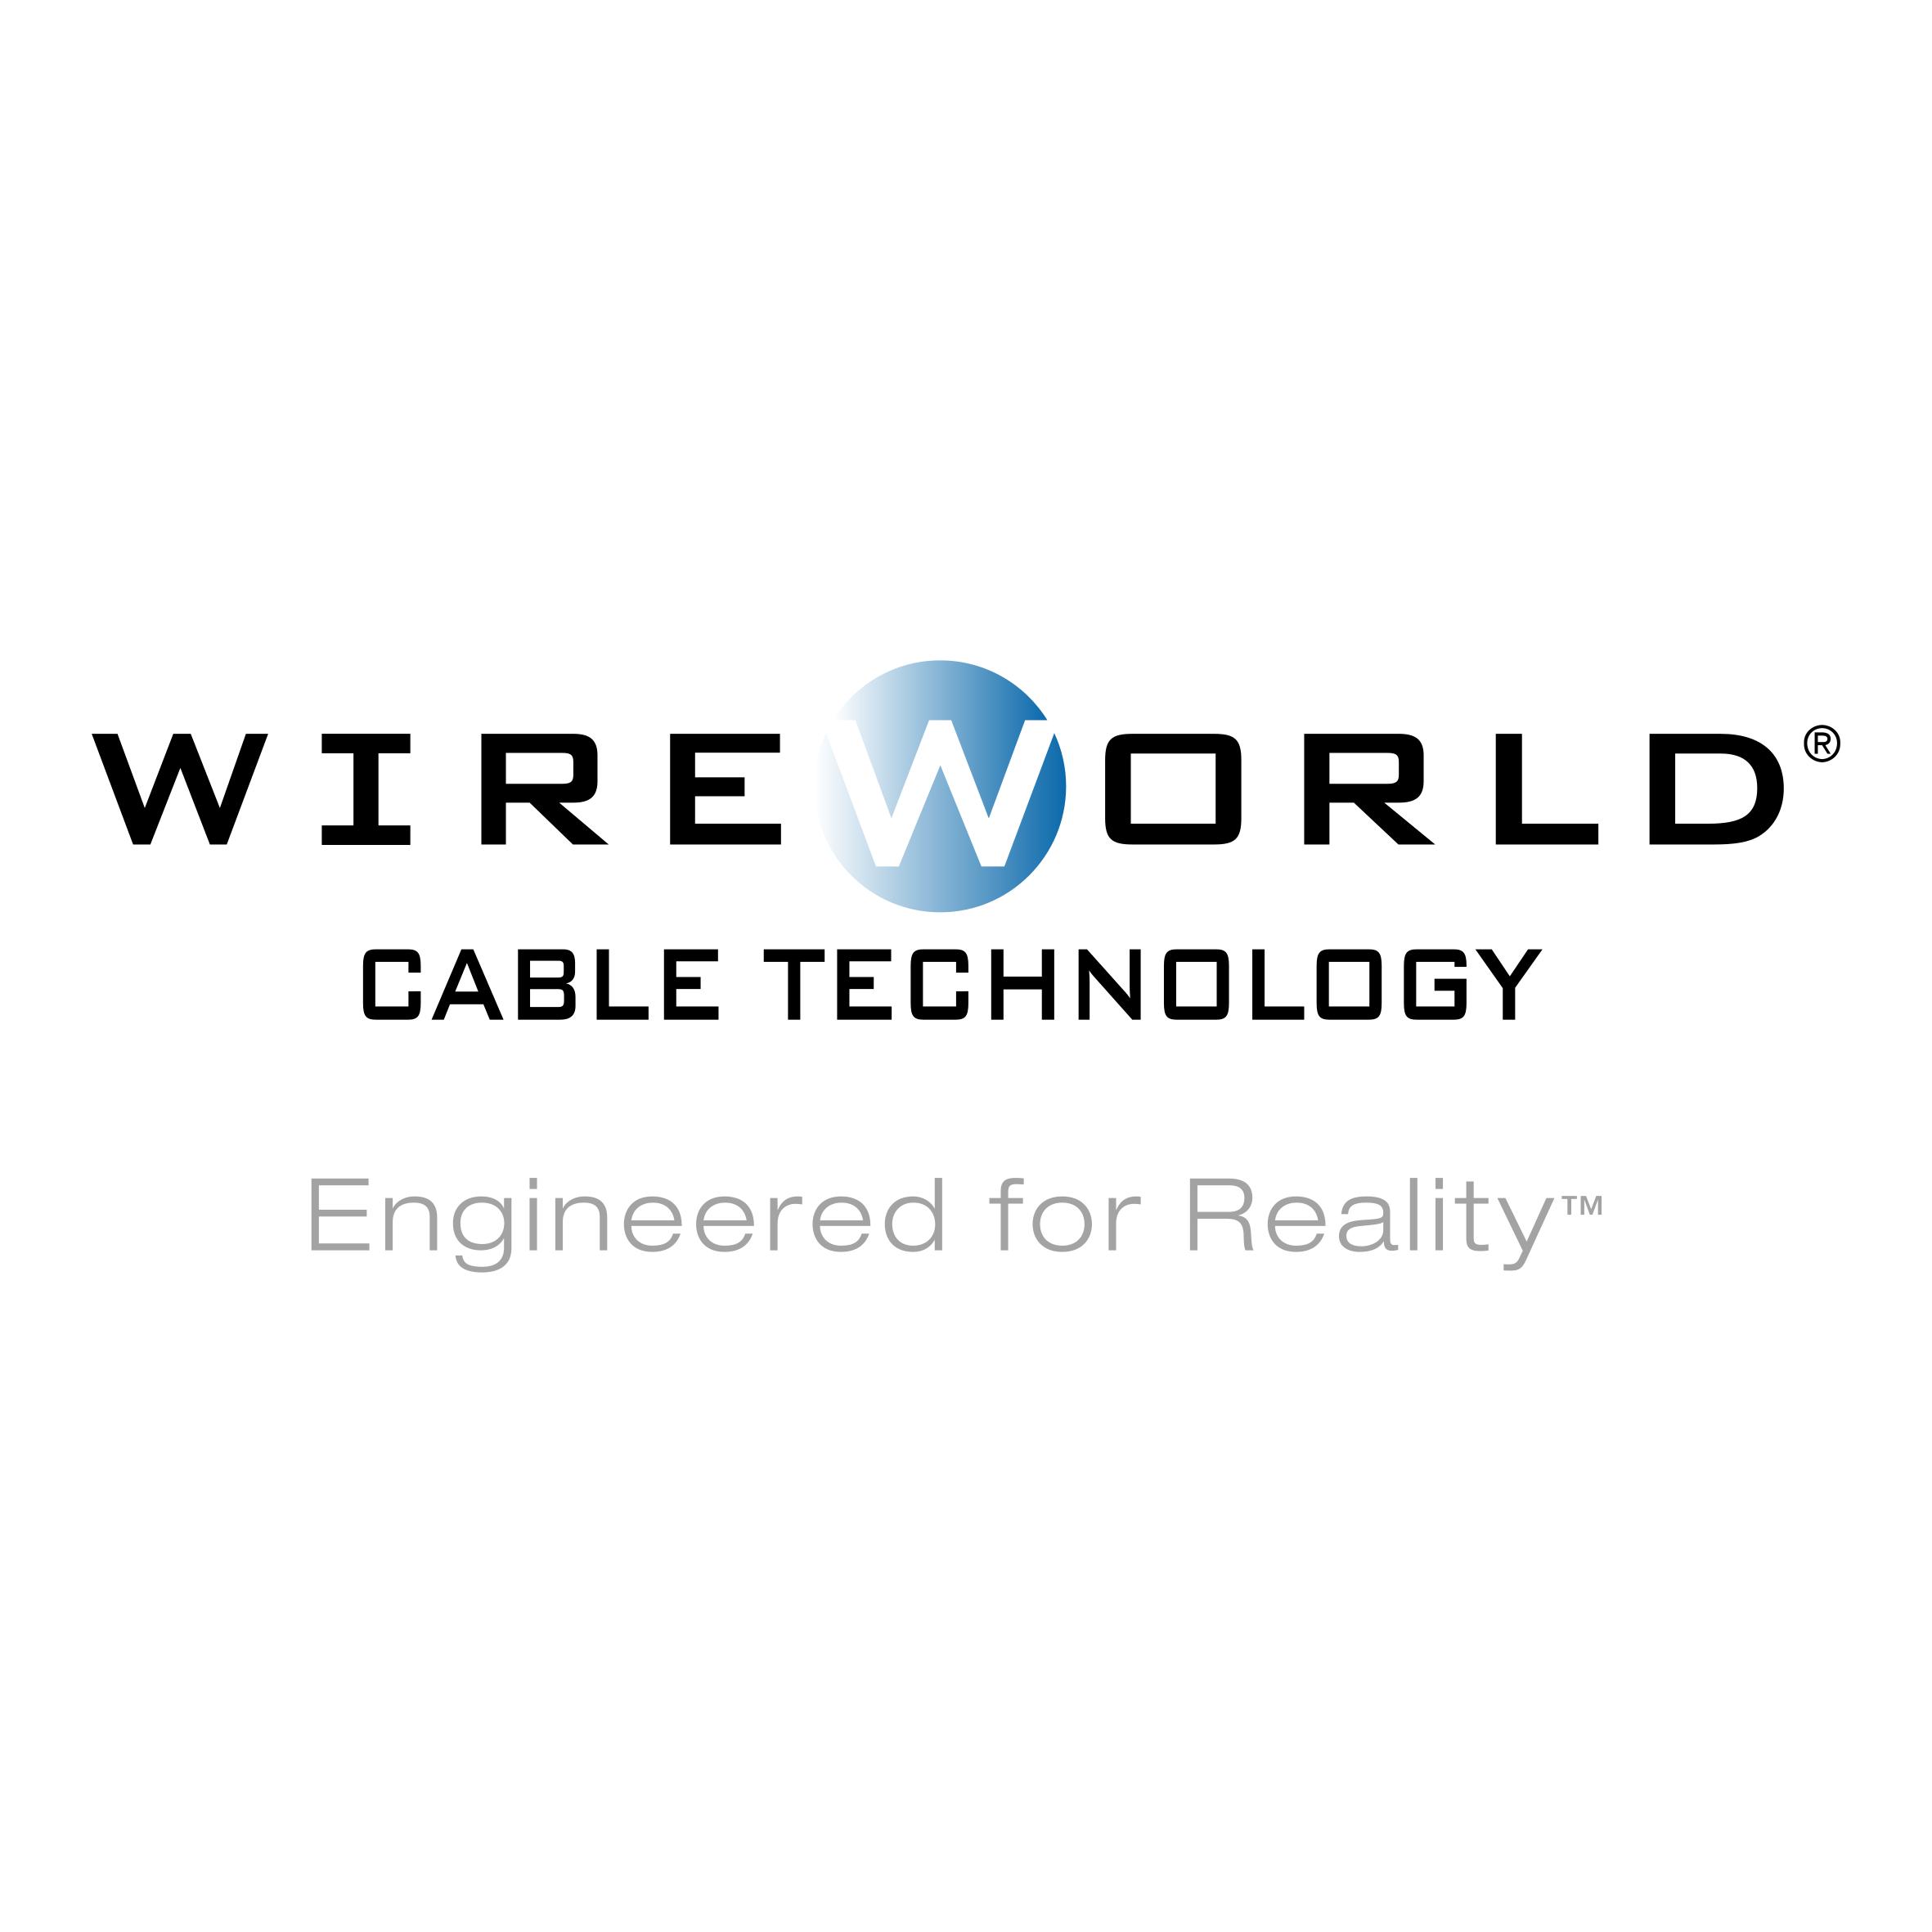 logo_wireworld_44.png